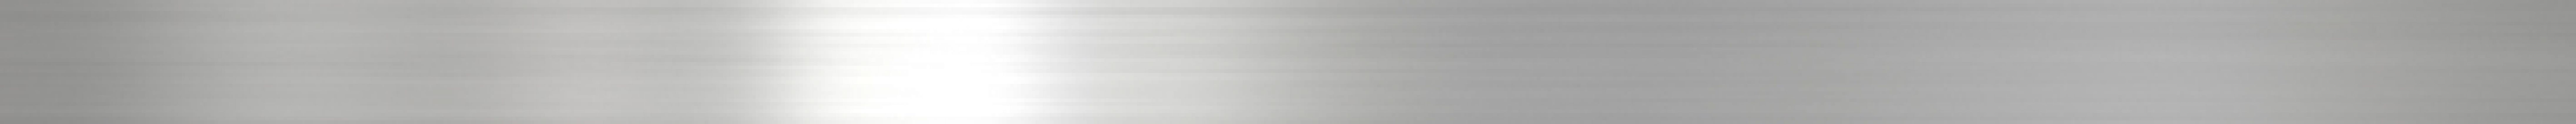 Бордюр метал. серебро глянцевое 2,2х97.7 2,2x97,7